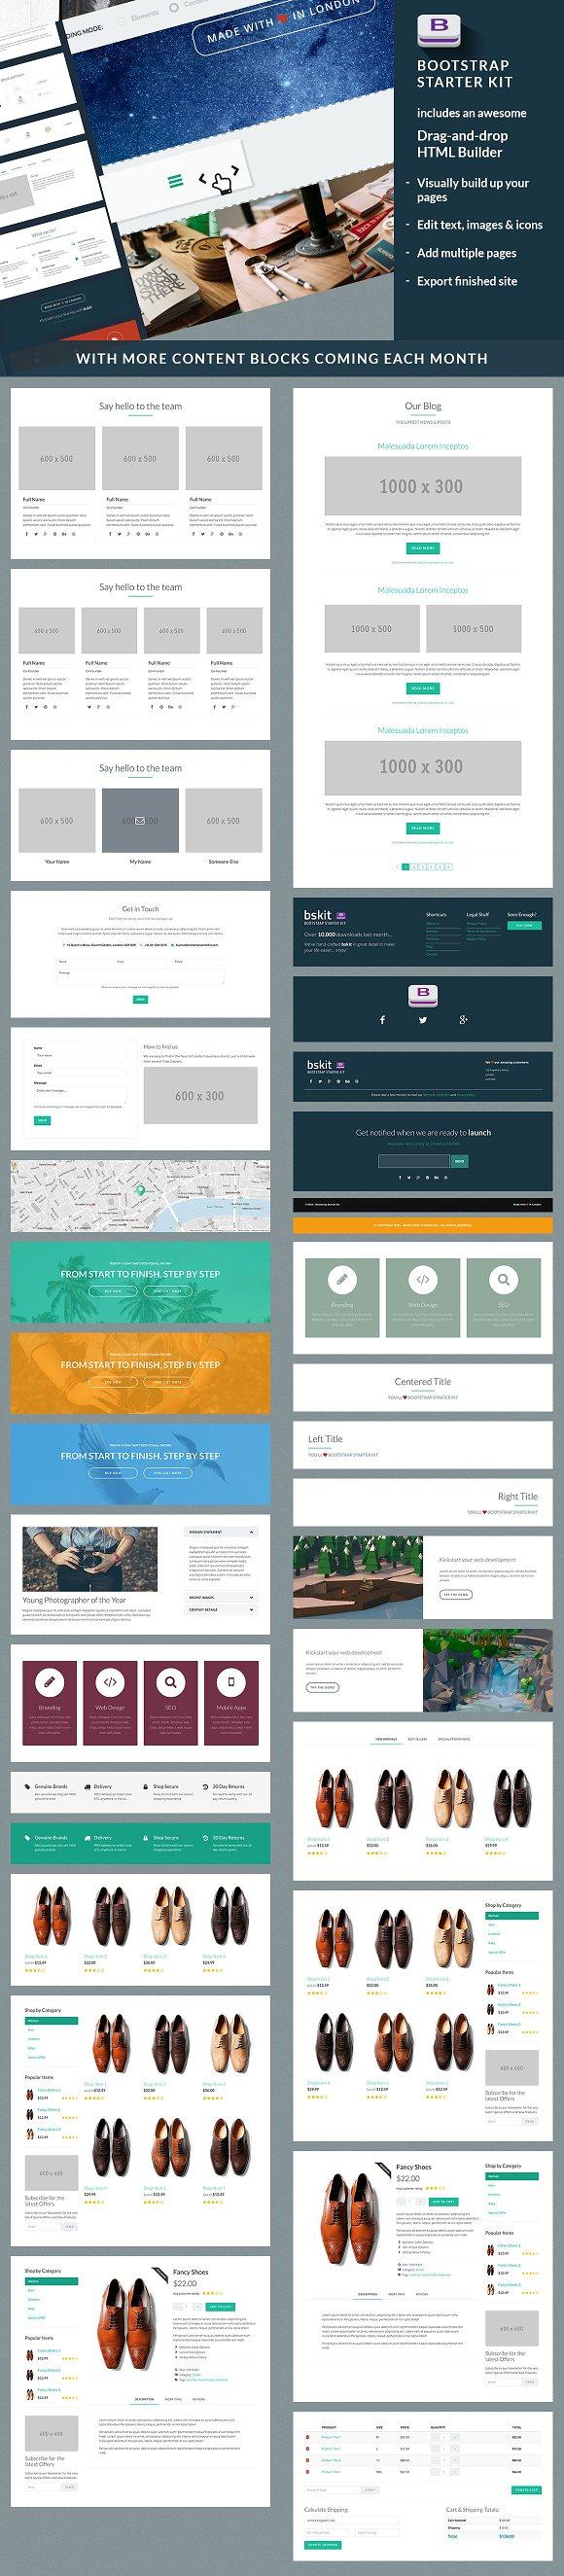 Bootstrap Starter Kit - Web Edition